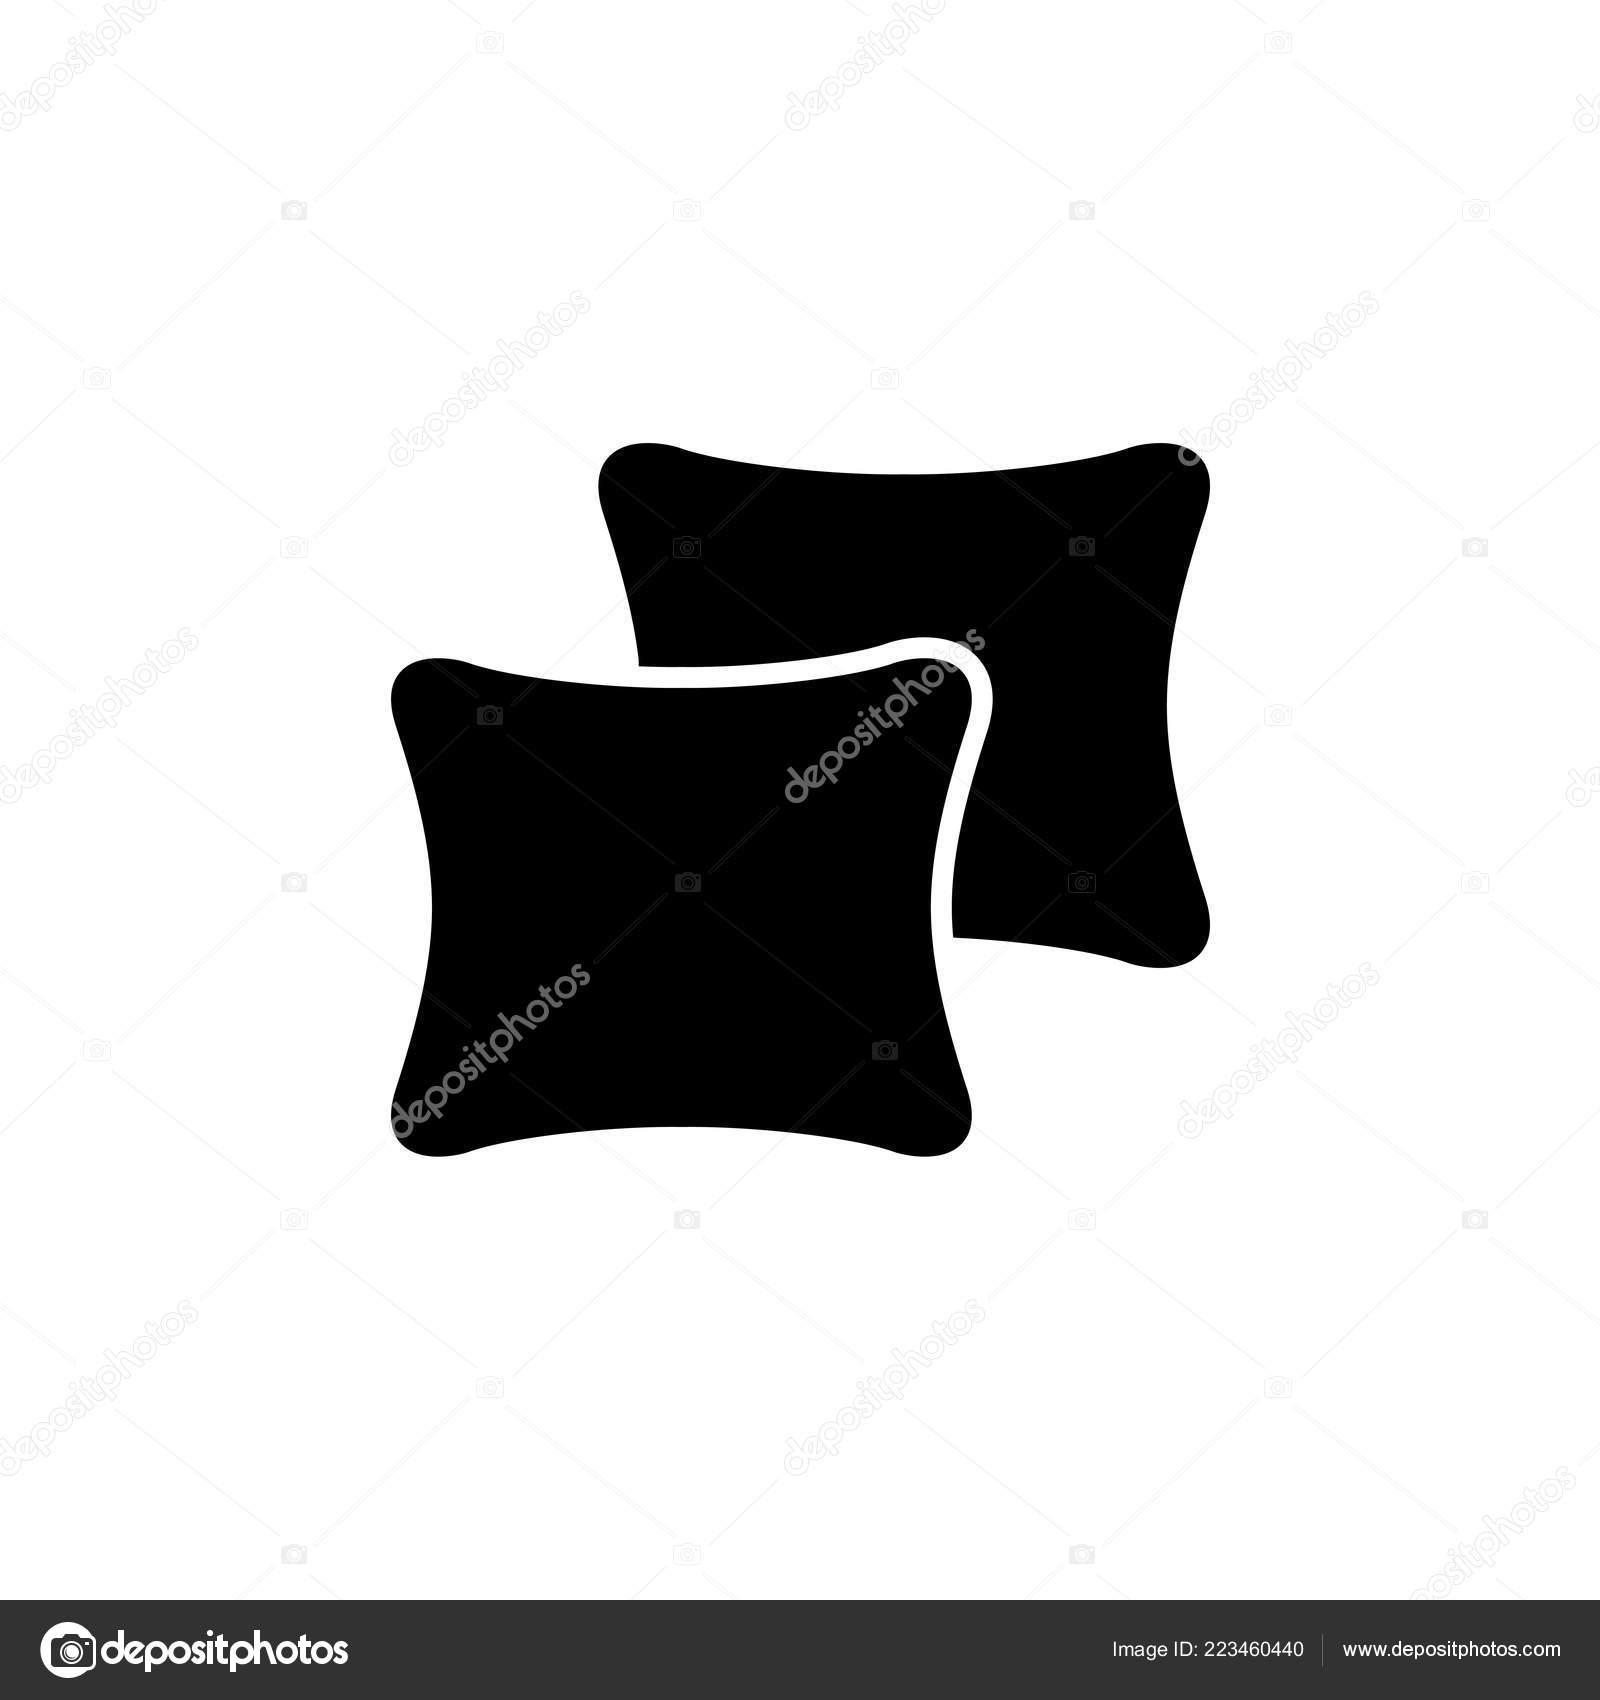 Black White Vector Illustration Square Throw Pillows Flat